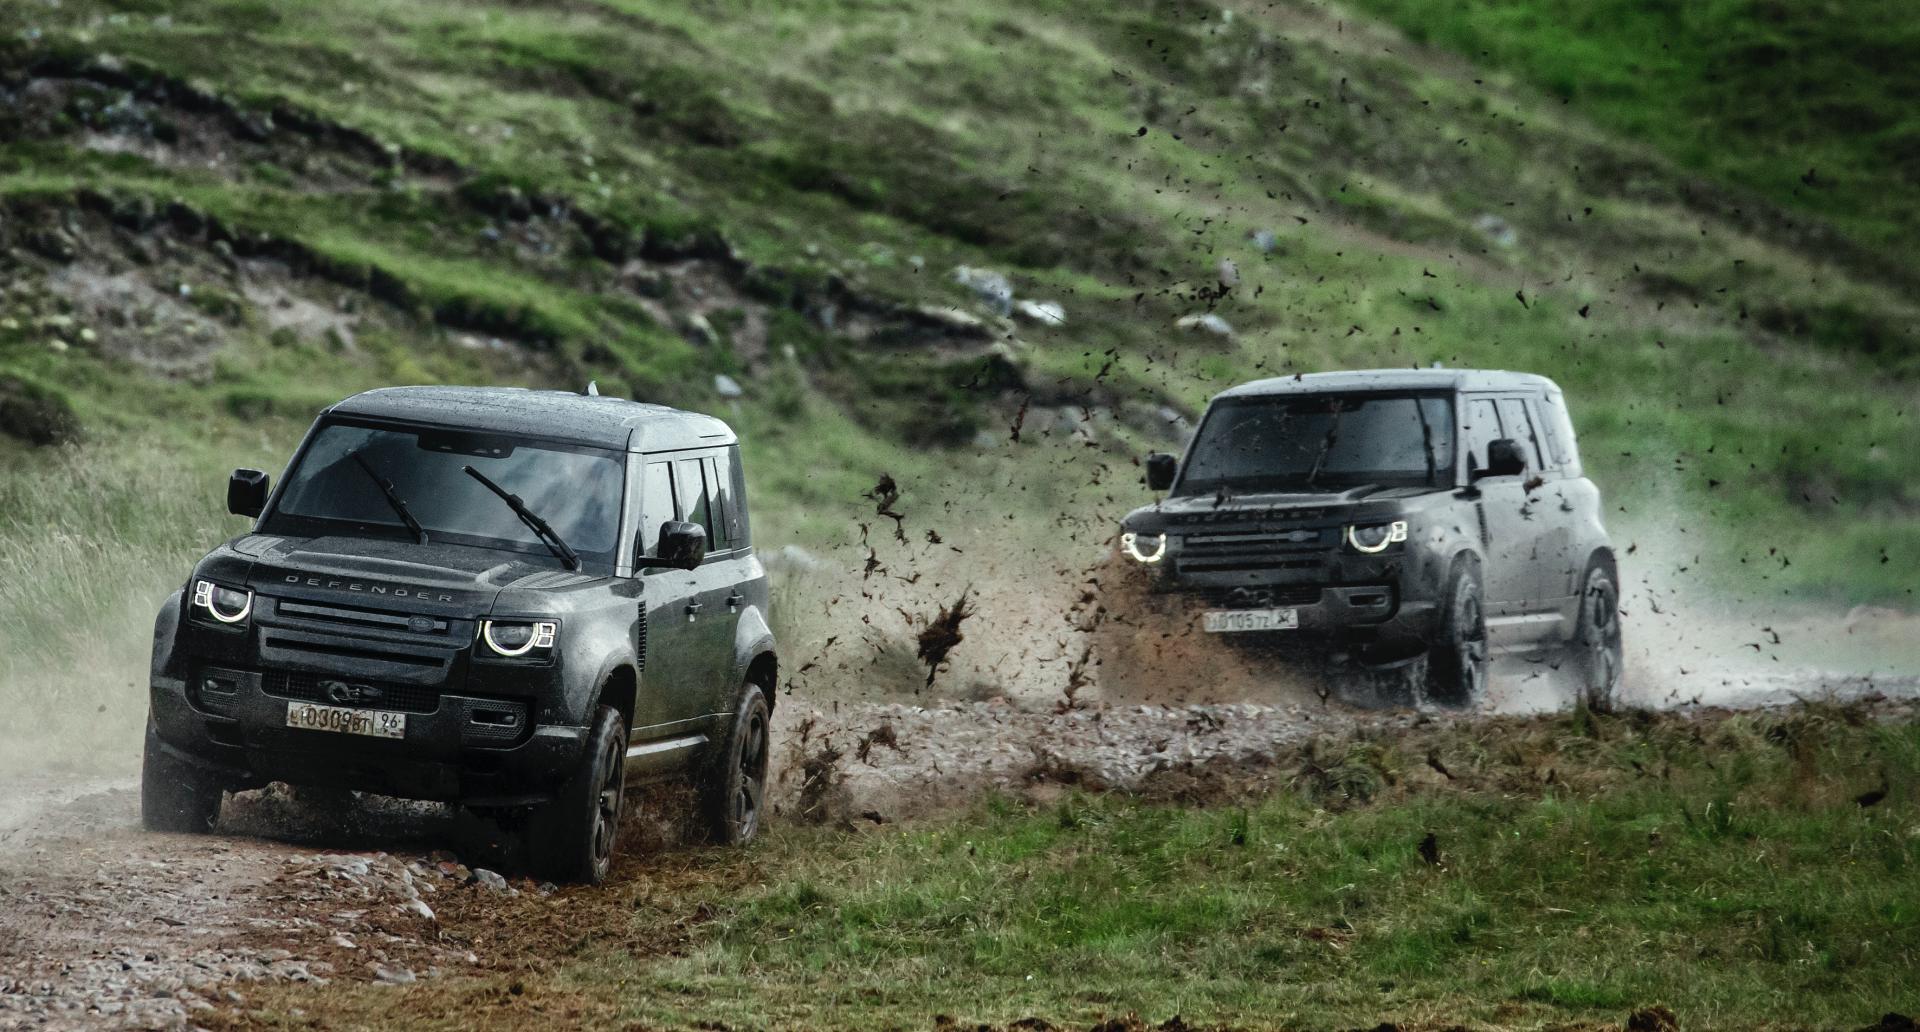 Land Rover Defender stunts No Time To Die 7